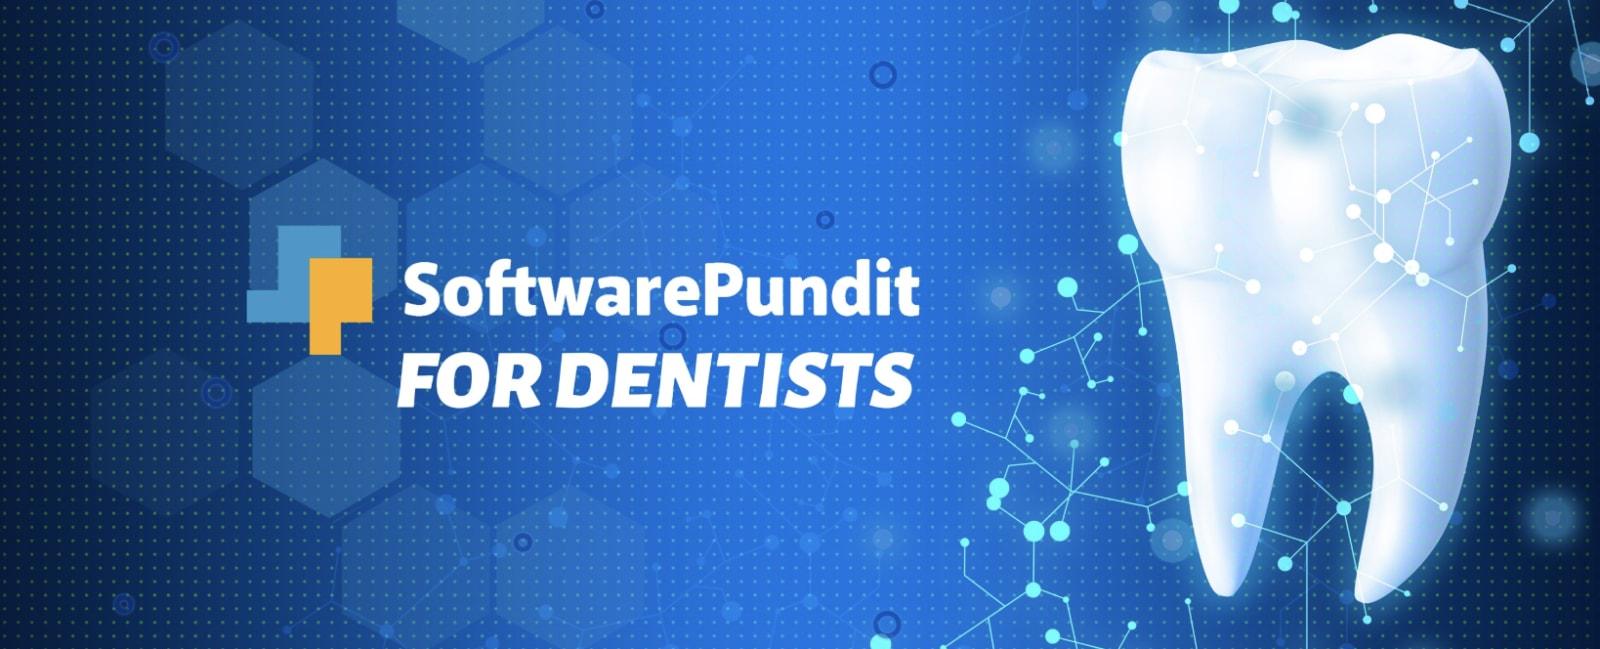 SoftwarePundit for Dentists